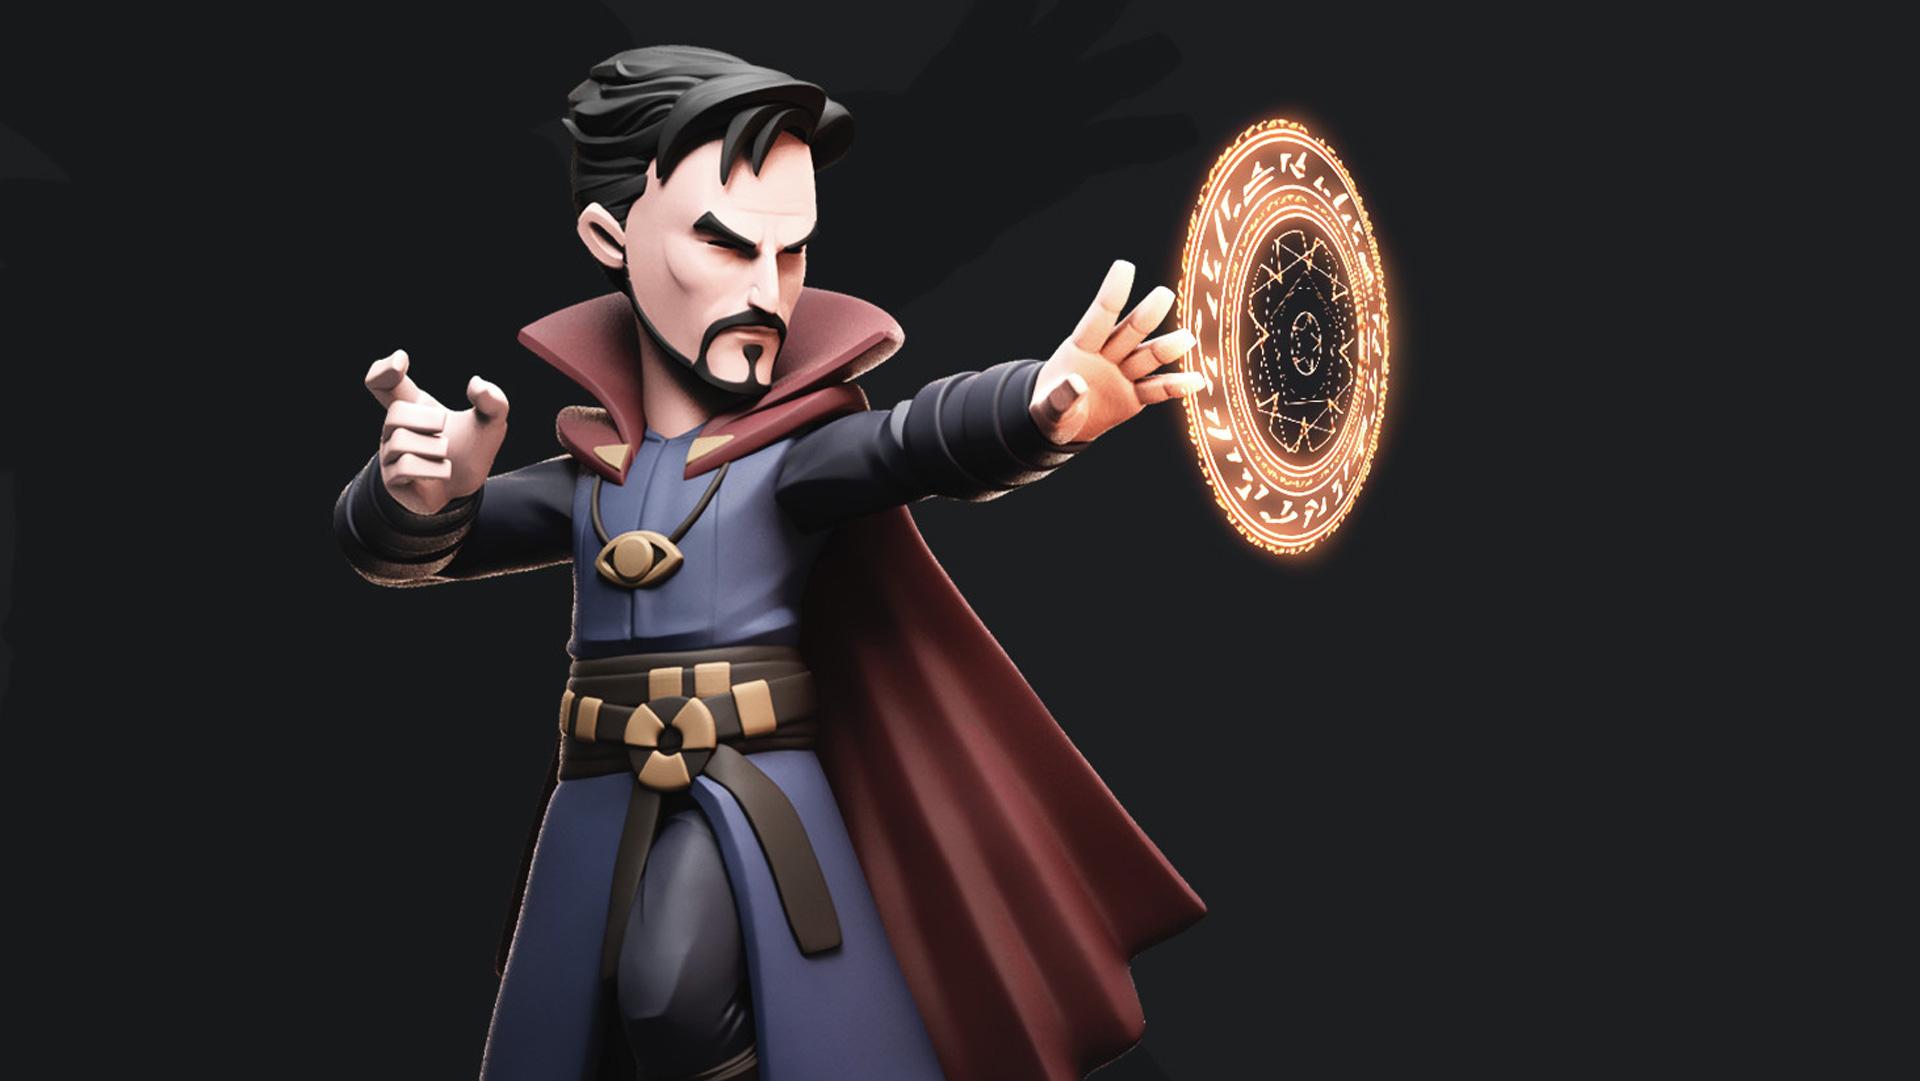 Doctor strange 3d avengers infinity war hd superheroes - Wallpaper avengers 3d ...